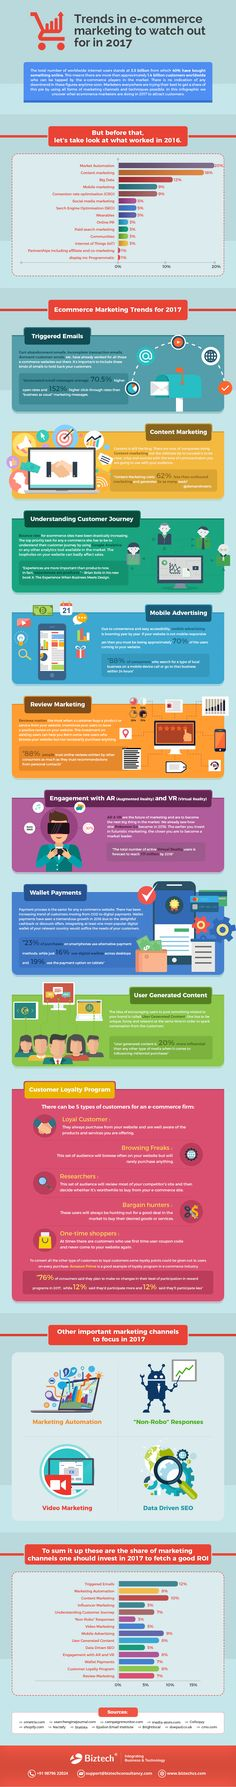 Tendencias sobre Comercio Electrónico #infografía #infographic #eCommerce